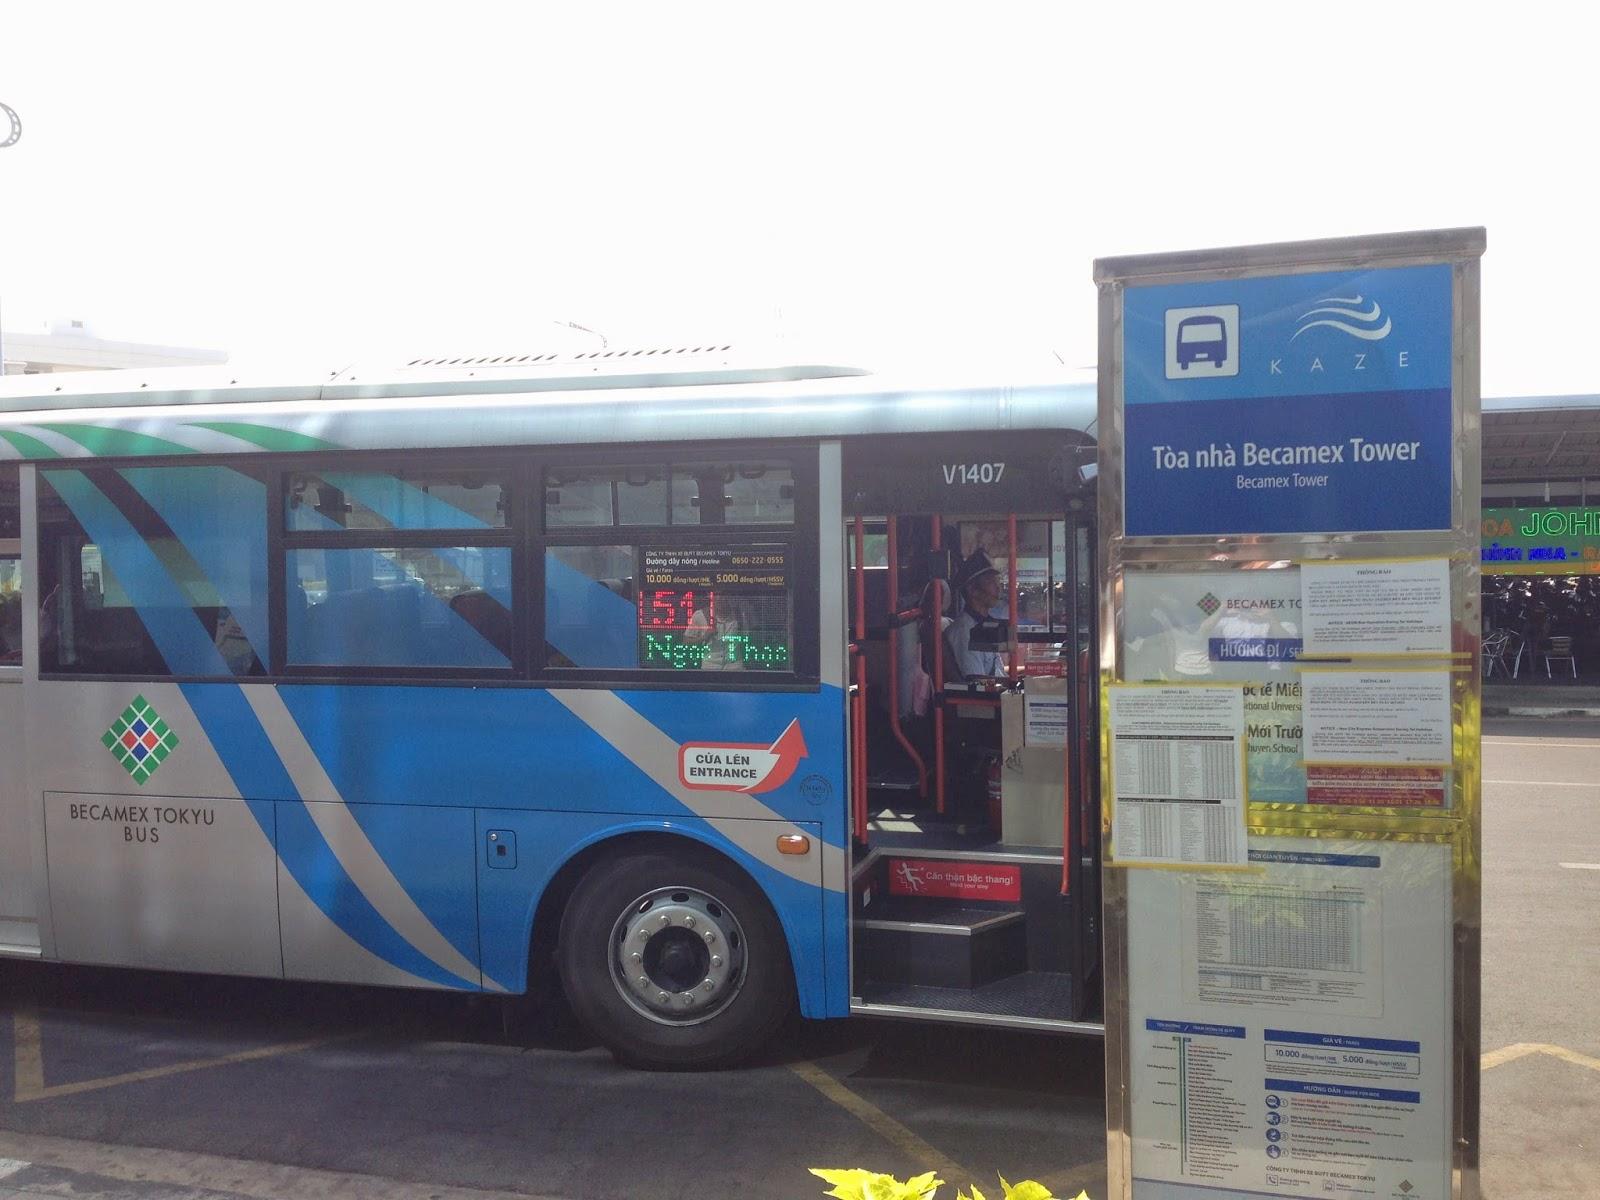 BECAMEX TOKYU BUS KAZE ベカメックス東急バス2